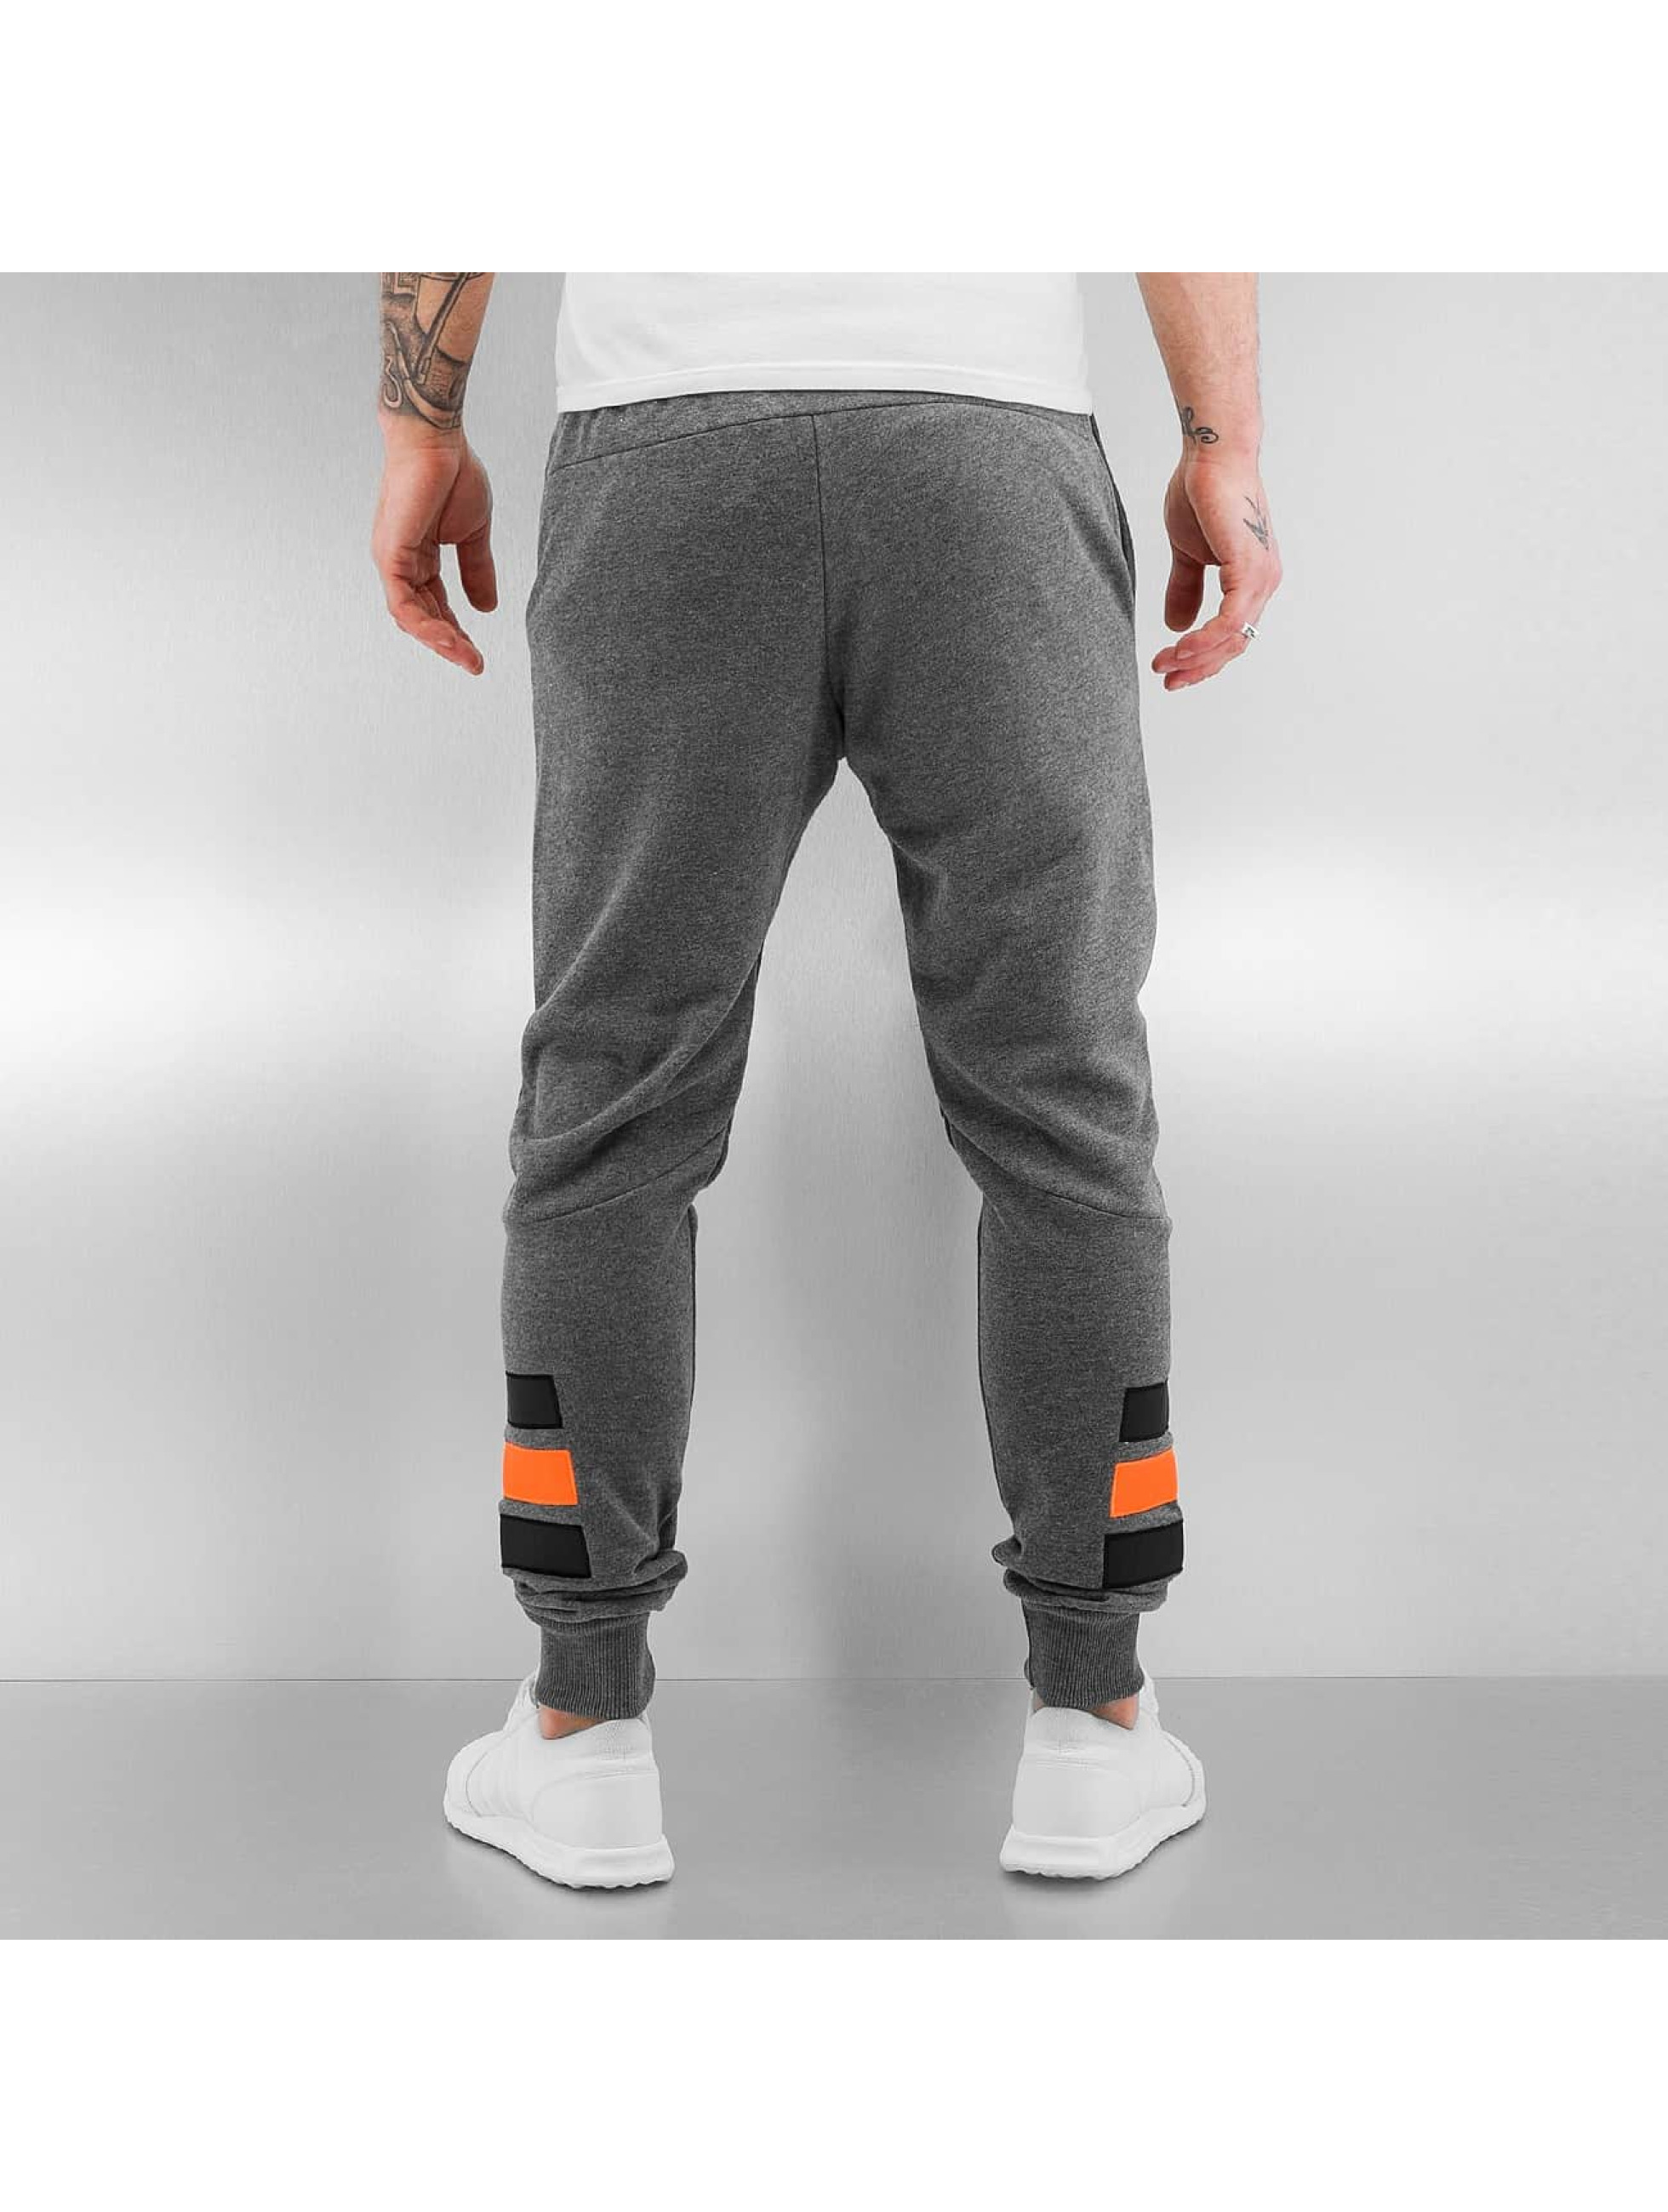 2Y Joggingbukser Manchester grå